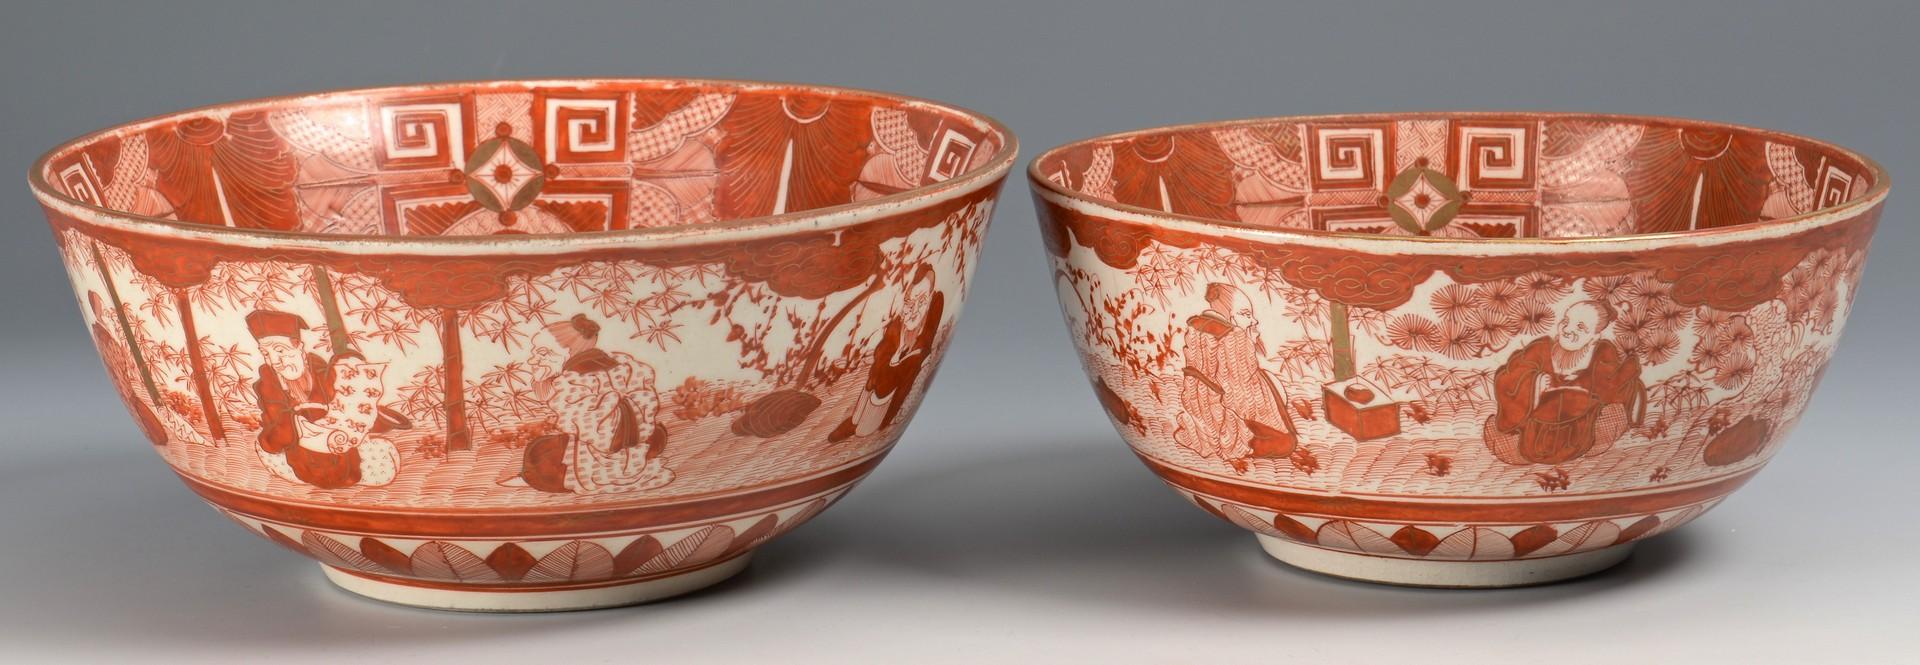 Lot 3832386: 6 Asian Porcelain Bowls incl. Gilded Kutani